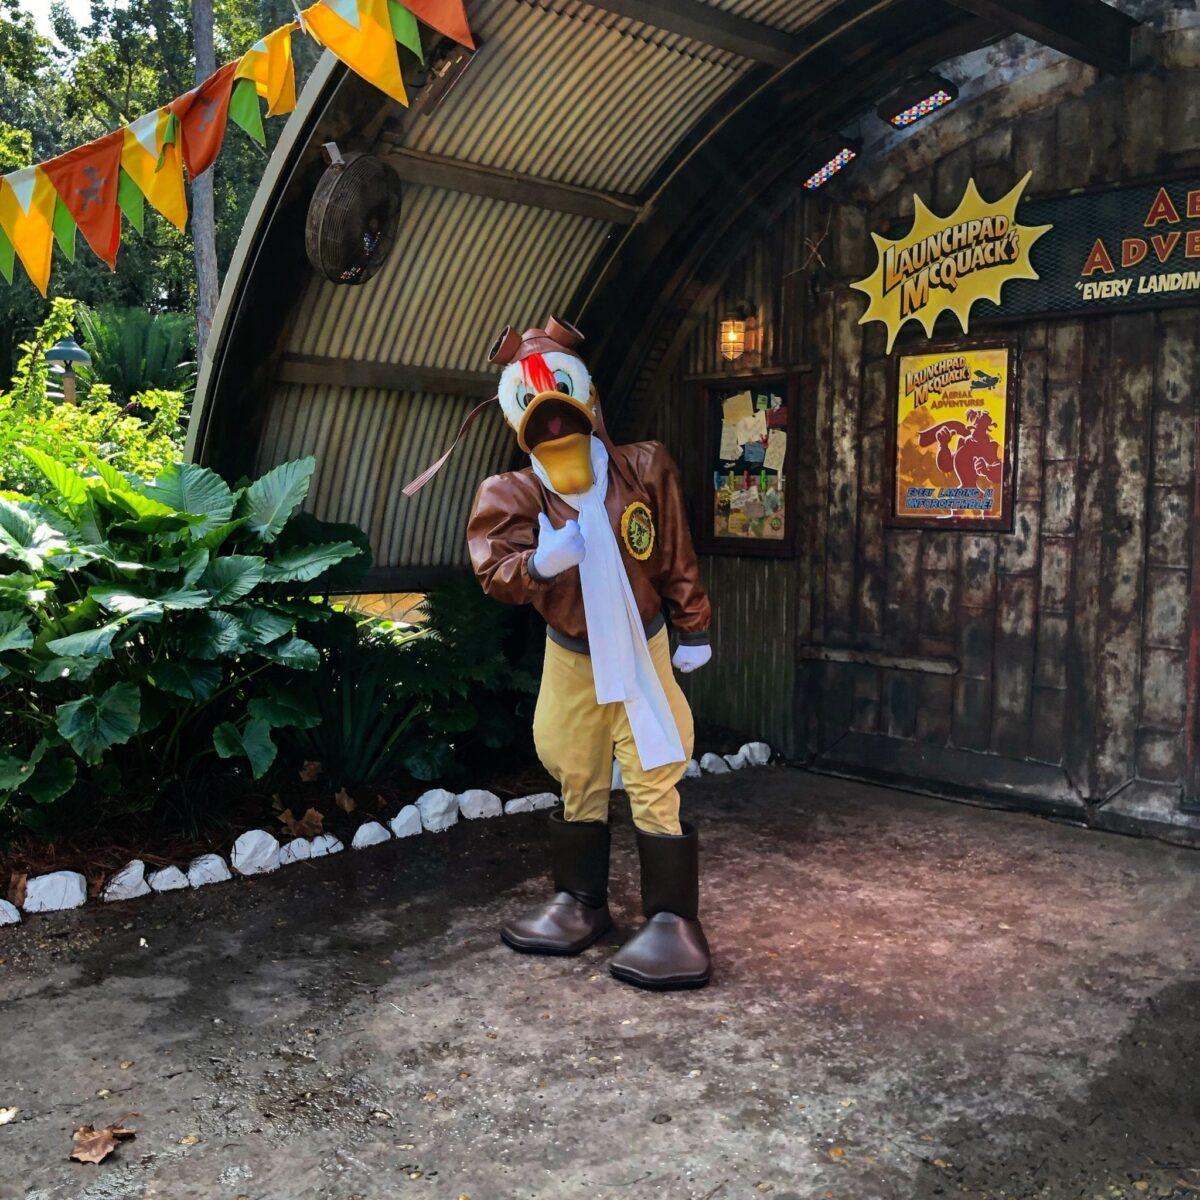 Meet Launchpad McQuack at Disney's Animal Kingdom!